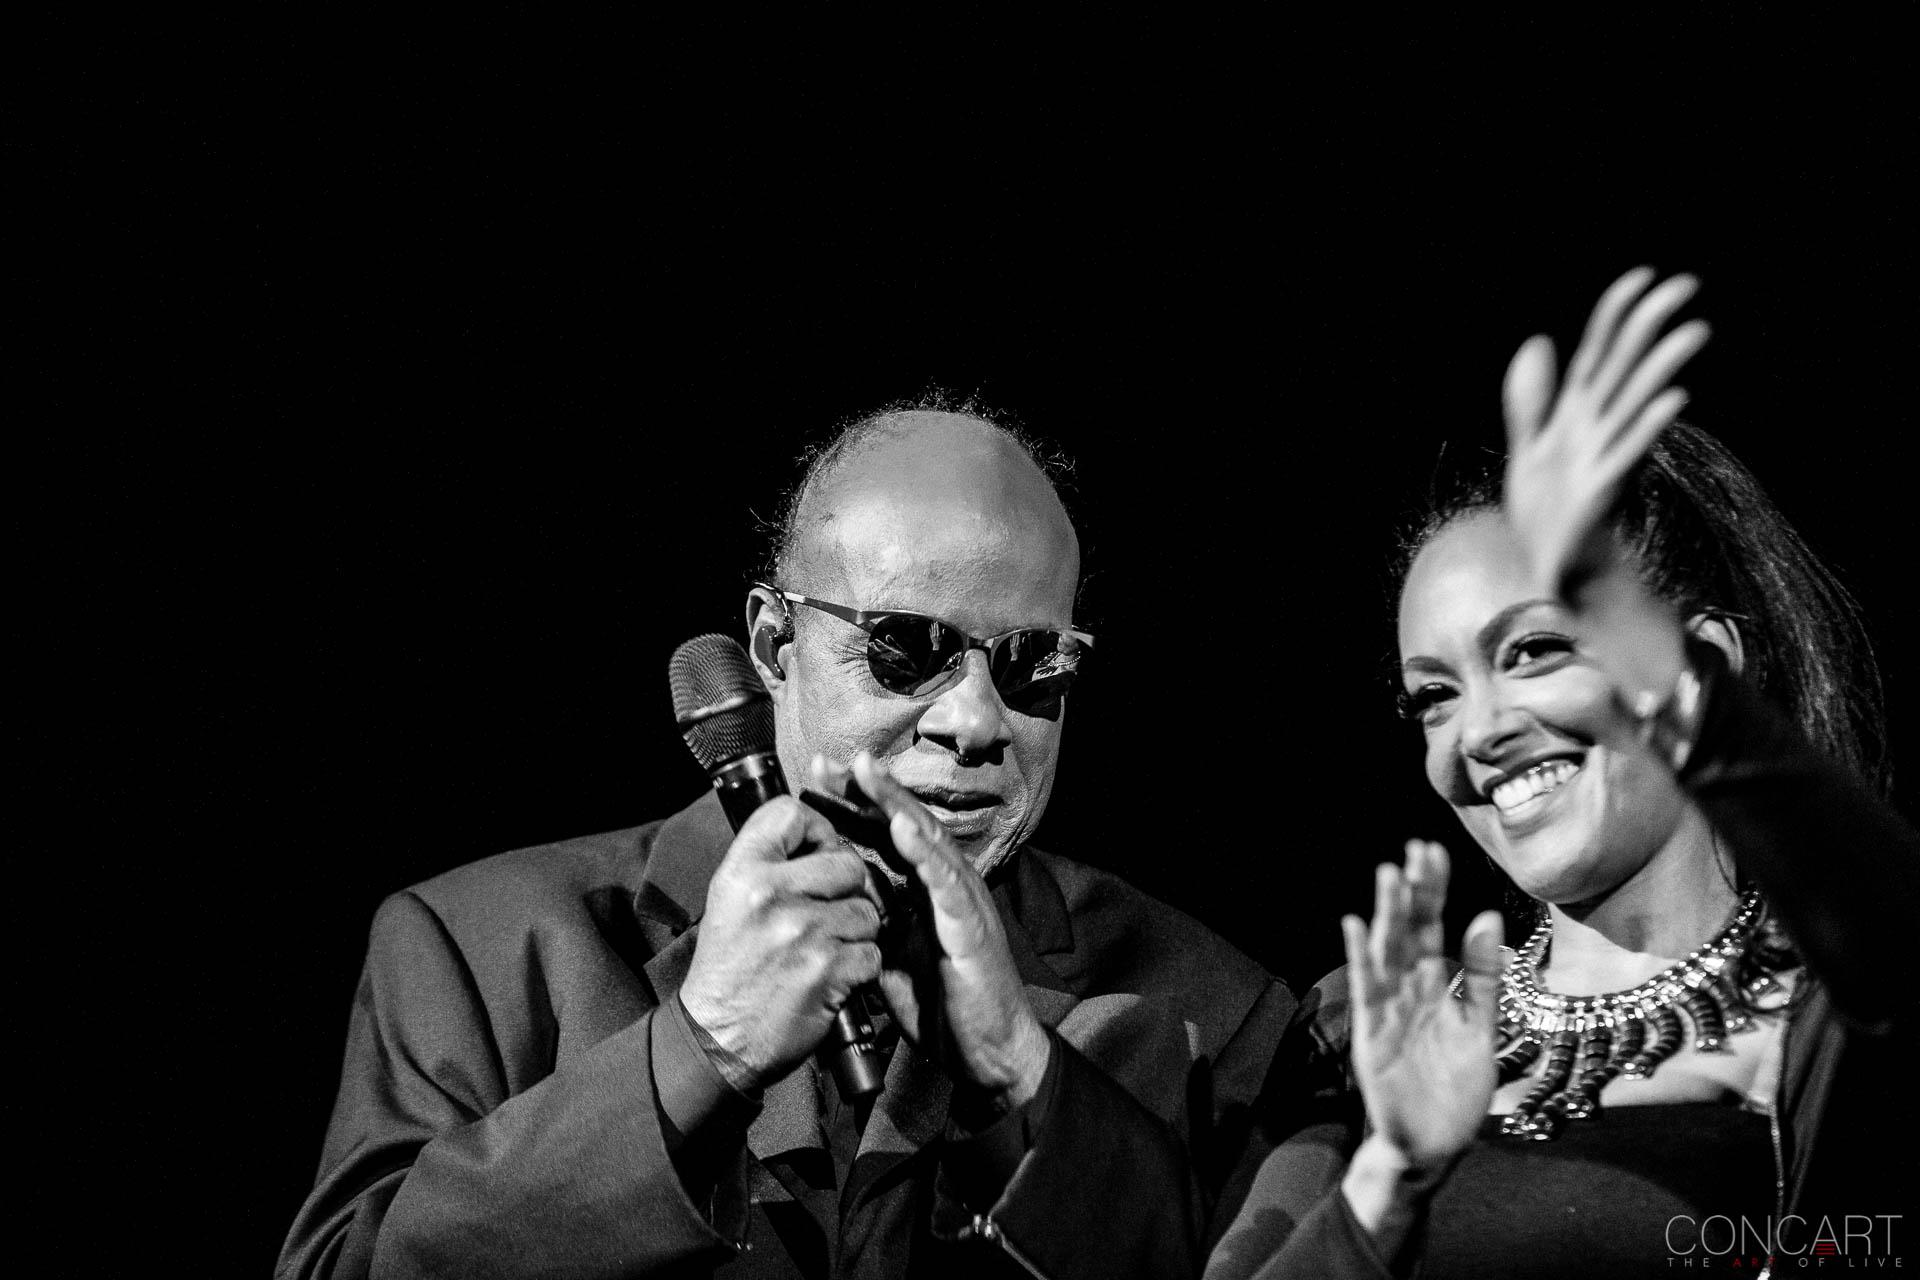 Stevie Wonder photo by Tyson White 2